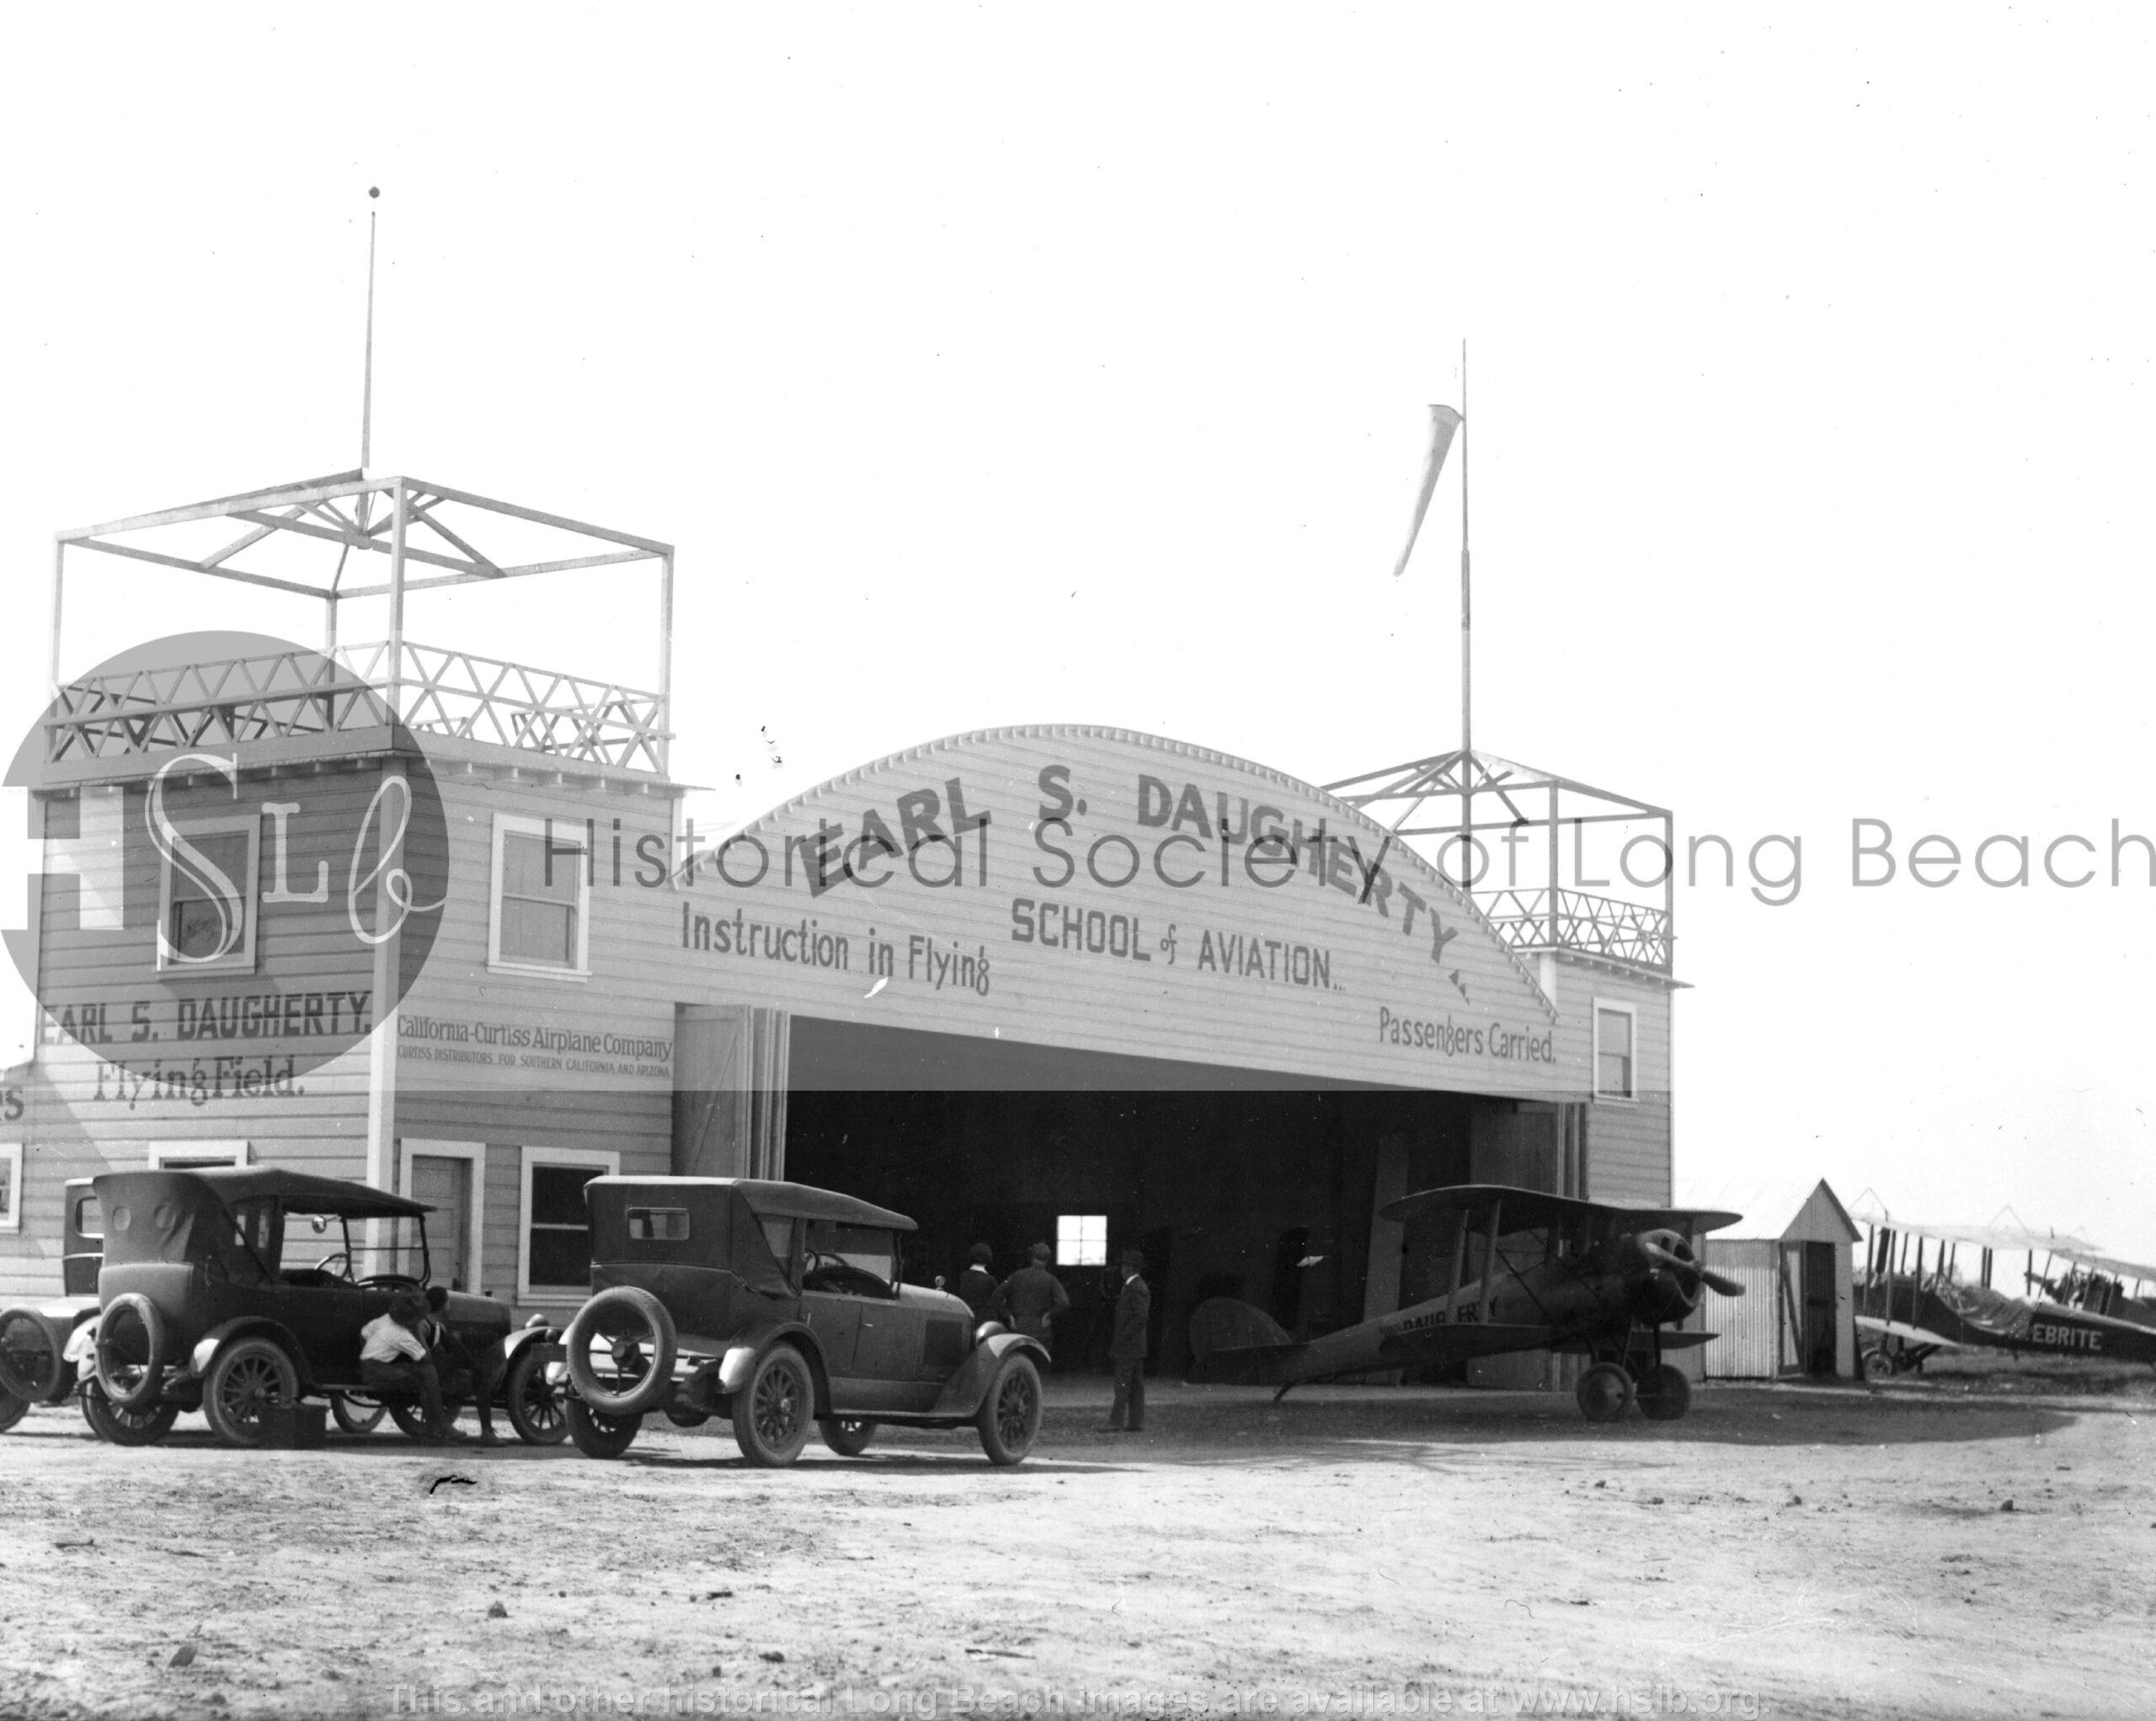 Daugherty School of Aviation, c. 1921